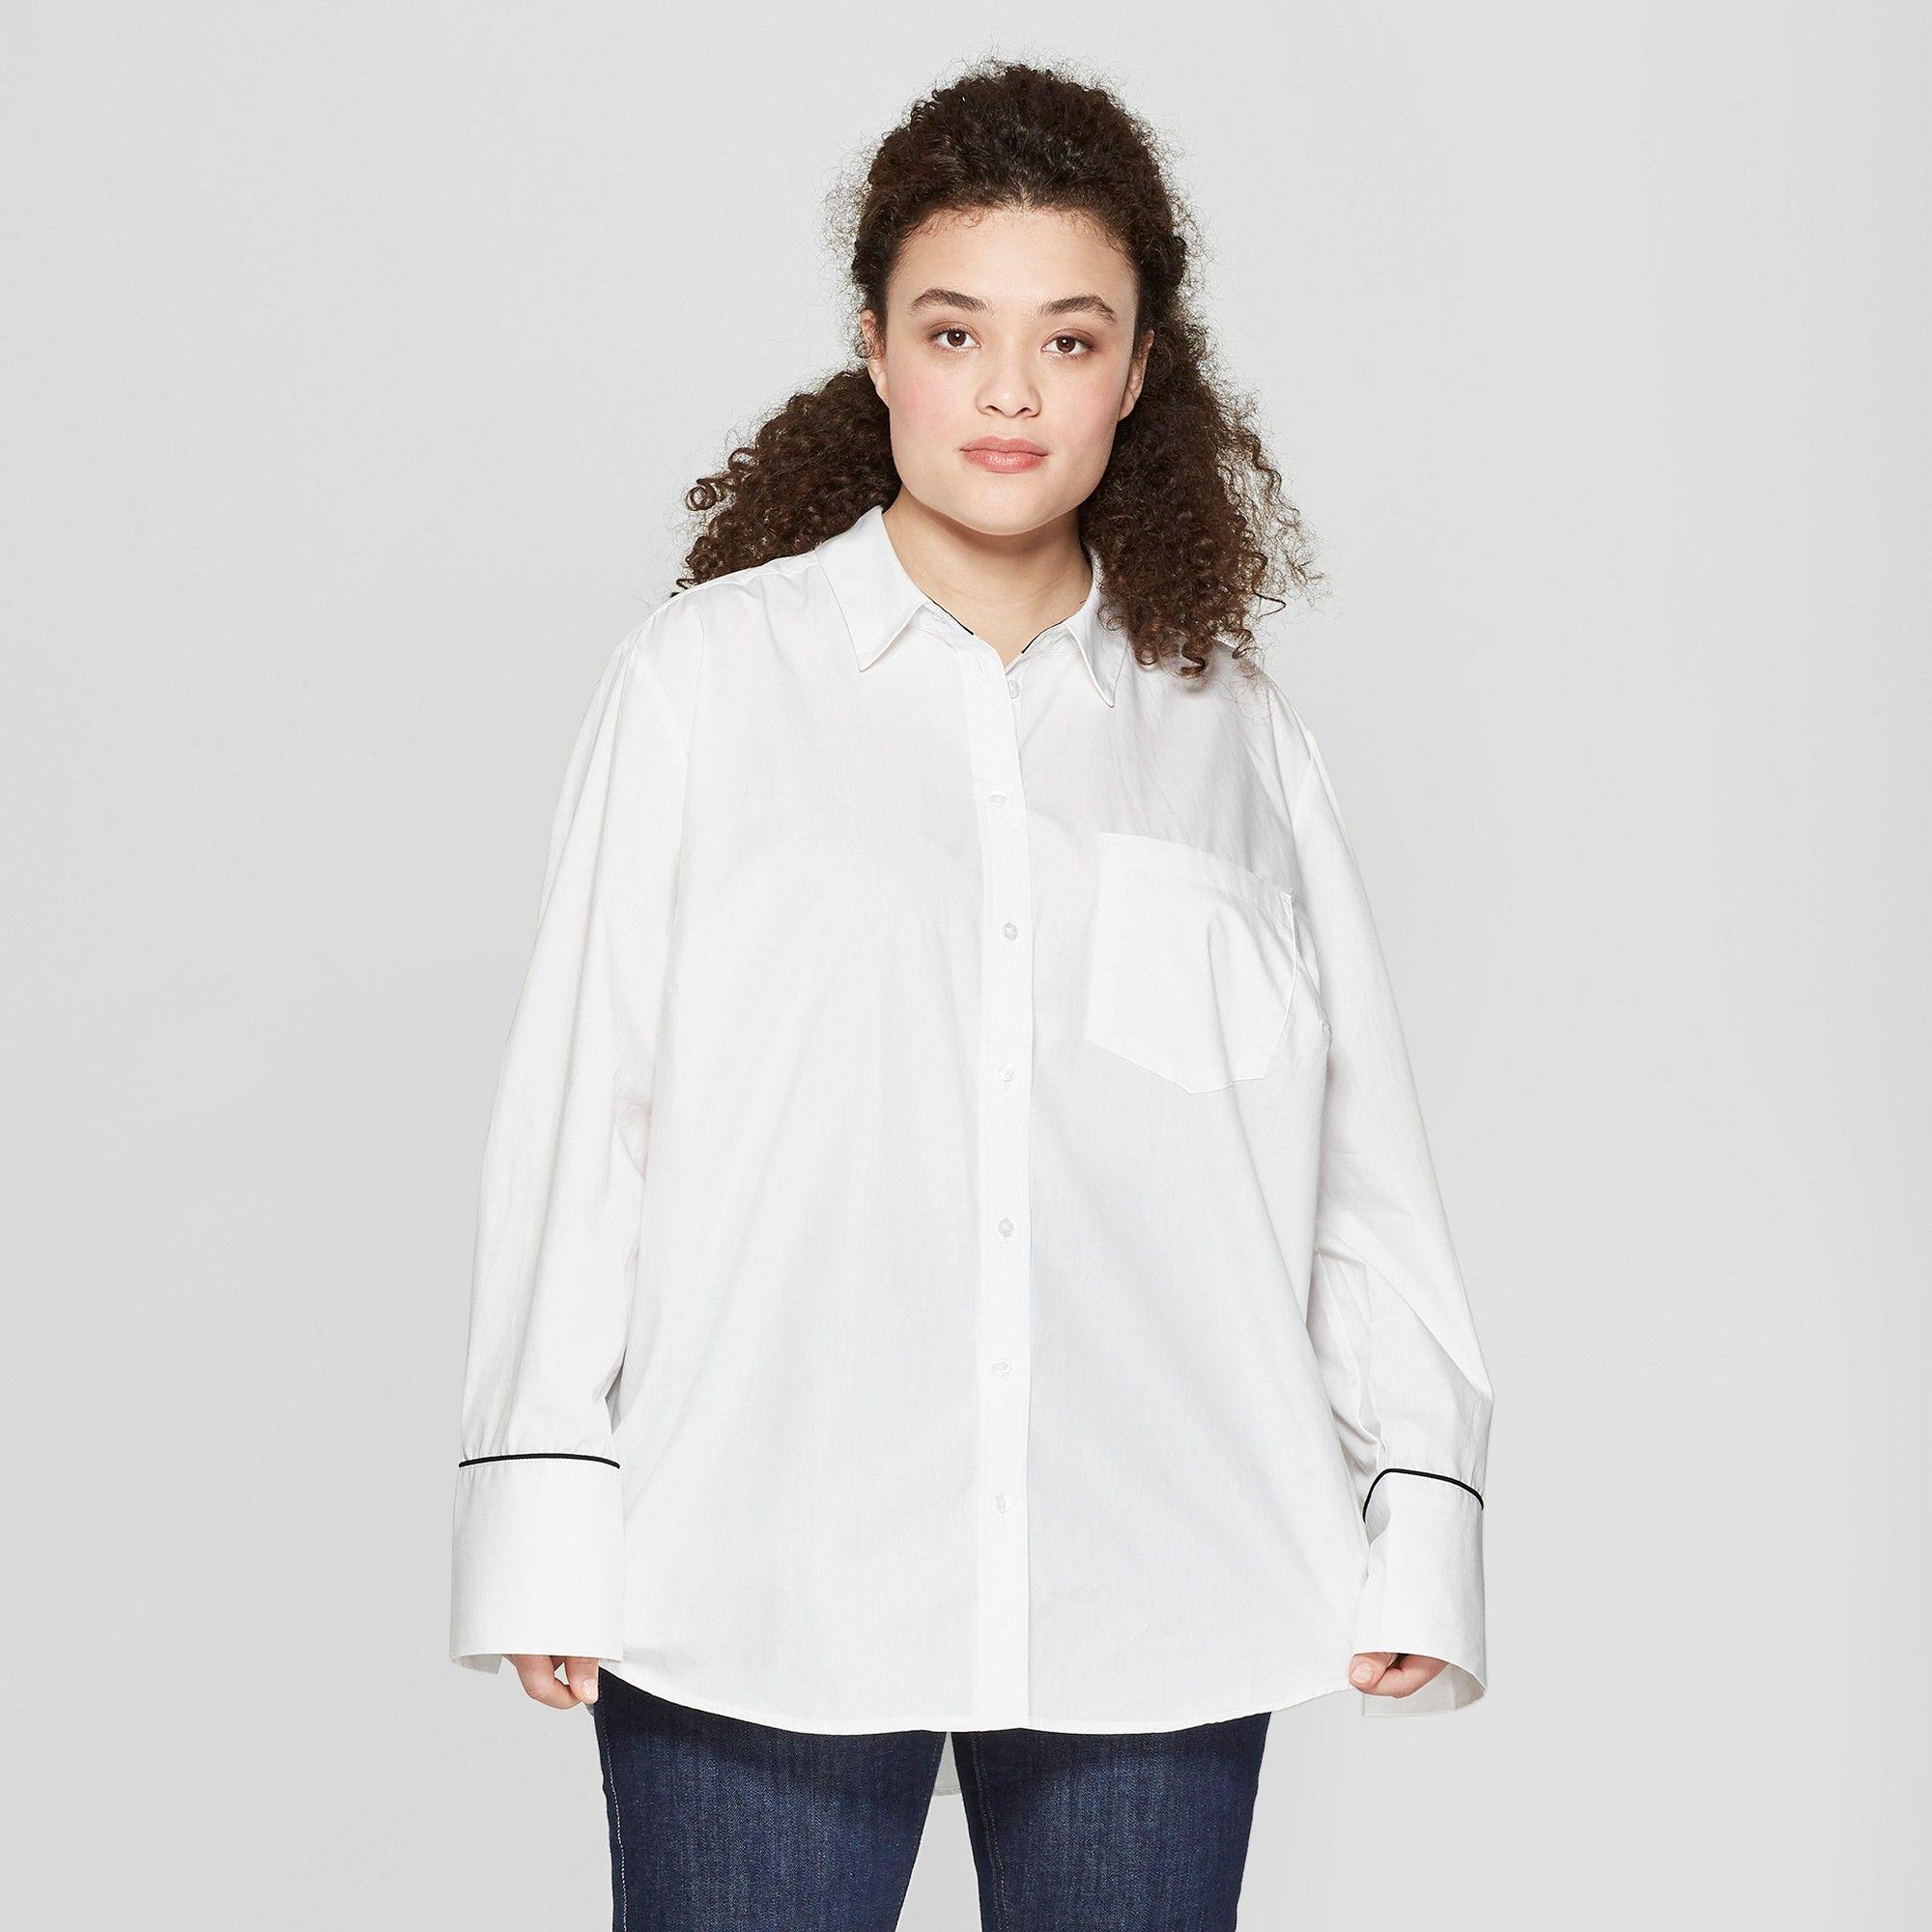 a494e9a3c Women's Plus Size Long Sleeve Button-Down Shirt - A New Day + Vital Voices  - White 3X